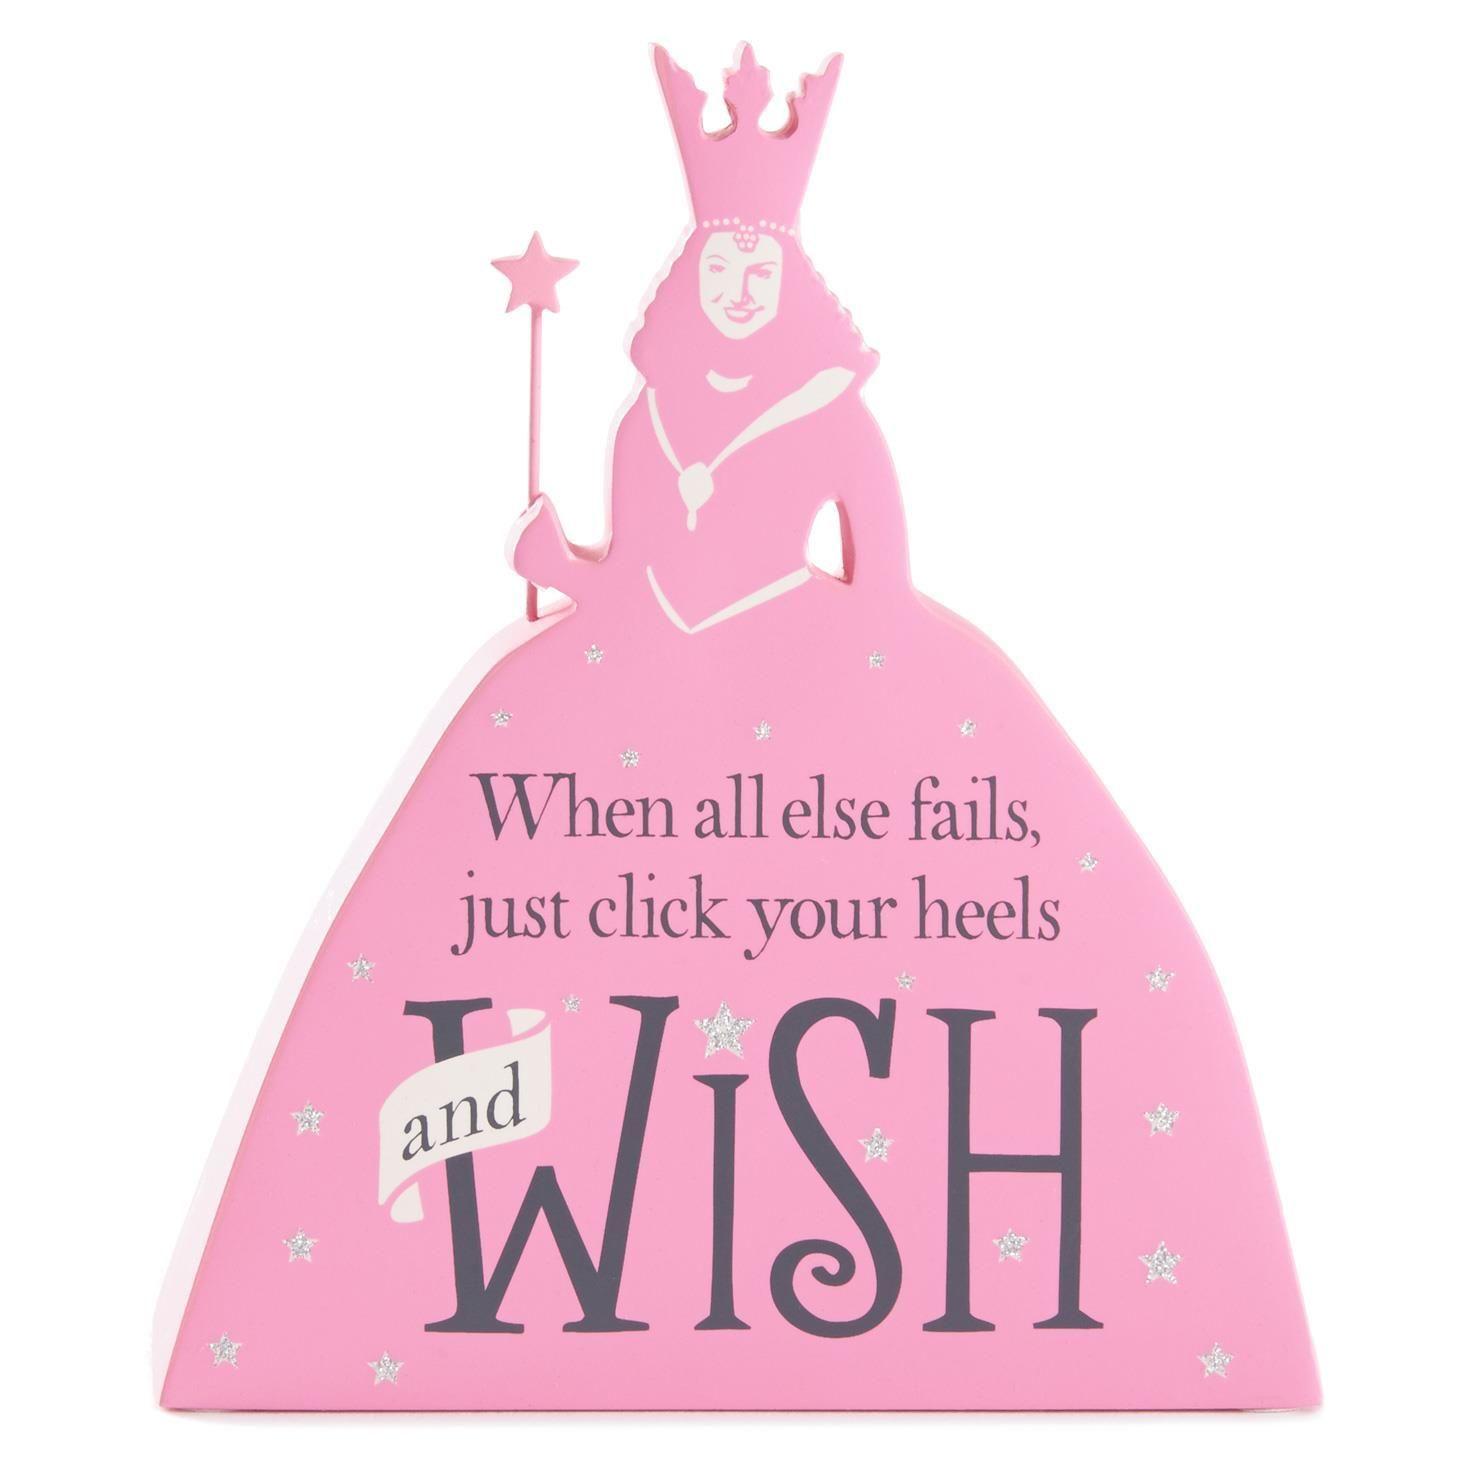 GLINDA THE GOOD WITCH™ from Hallmark's Wizard of Oz line...